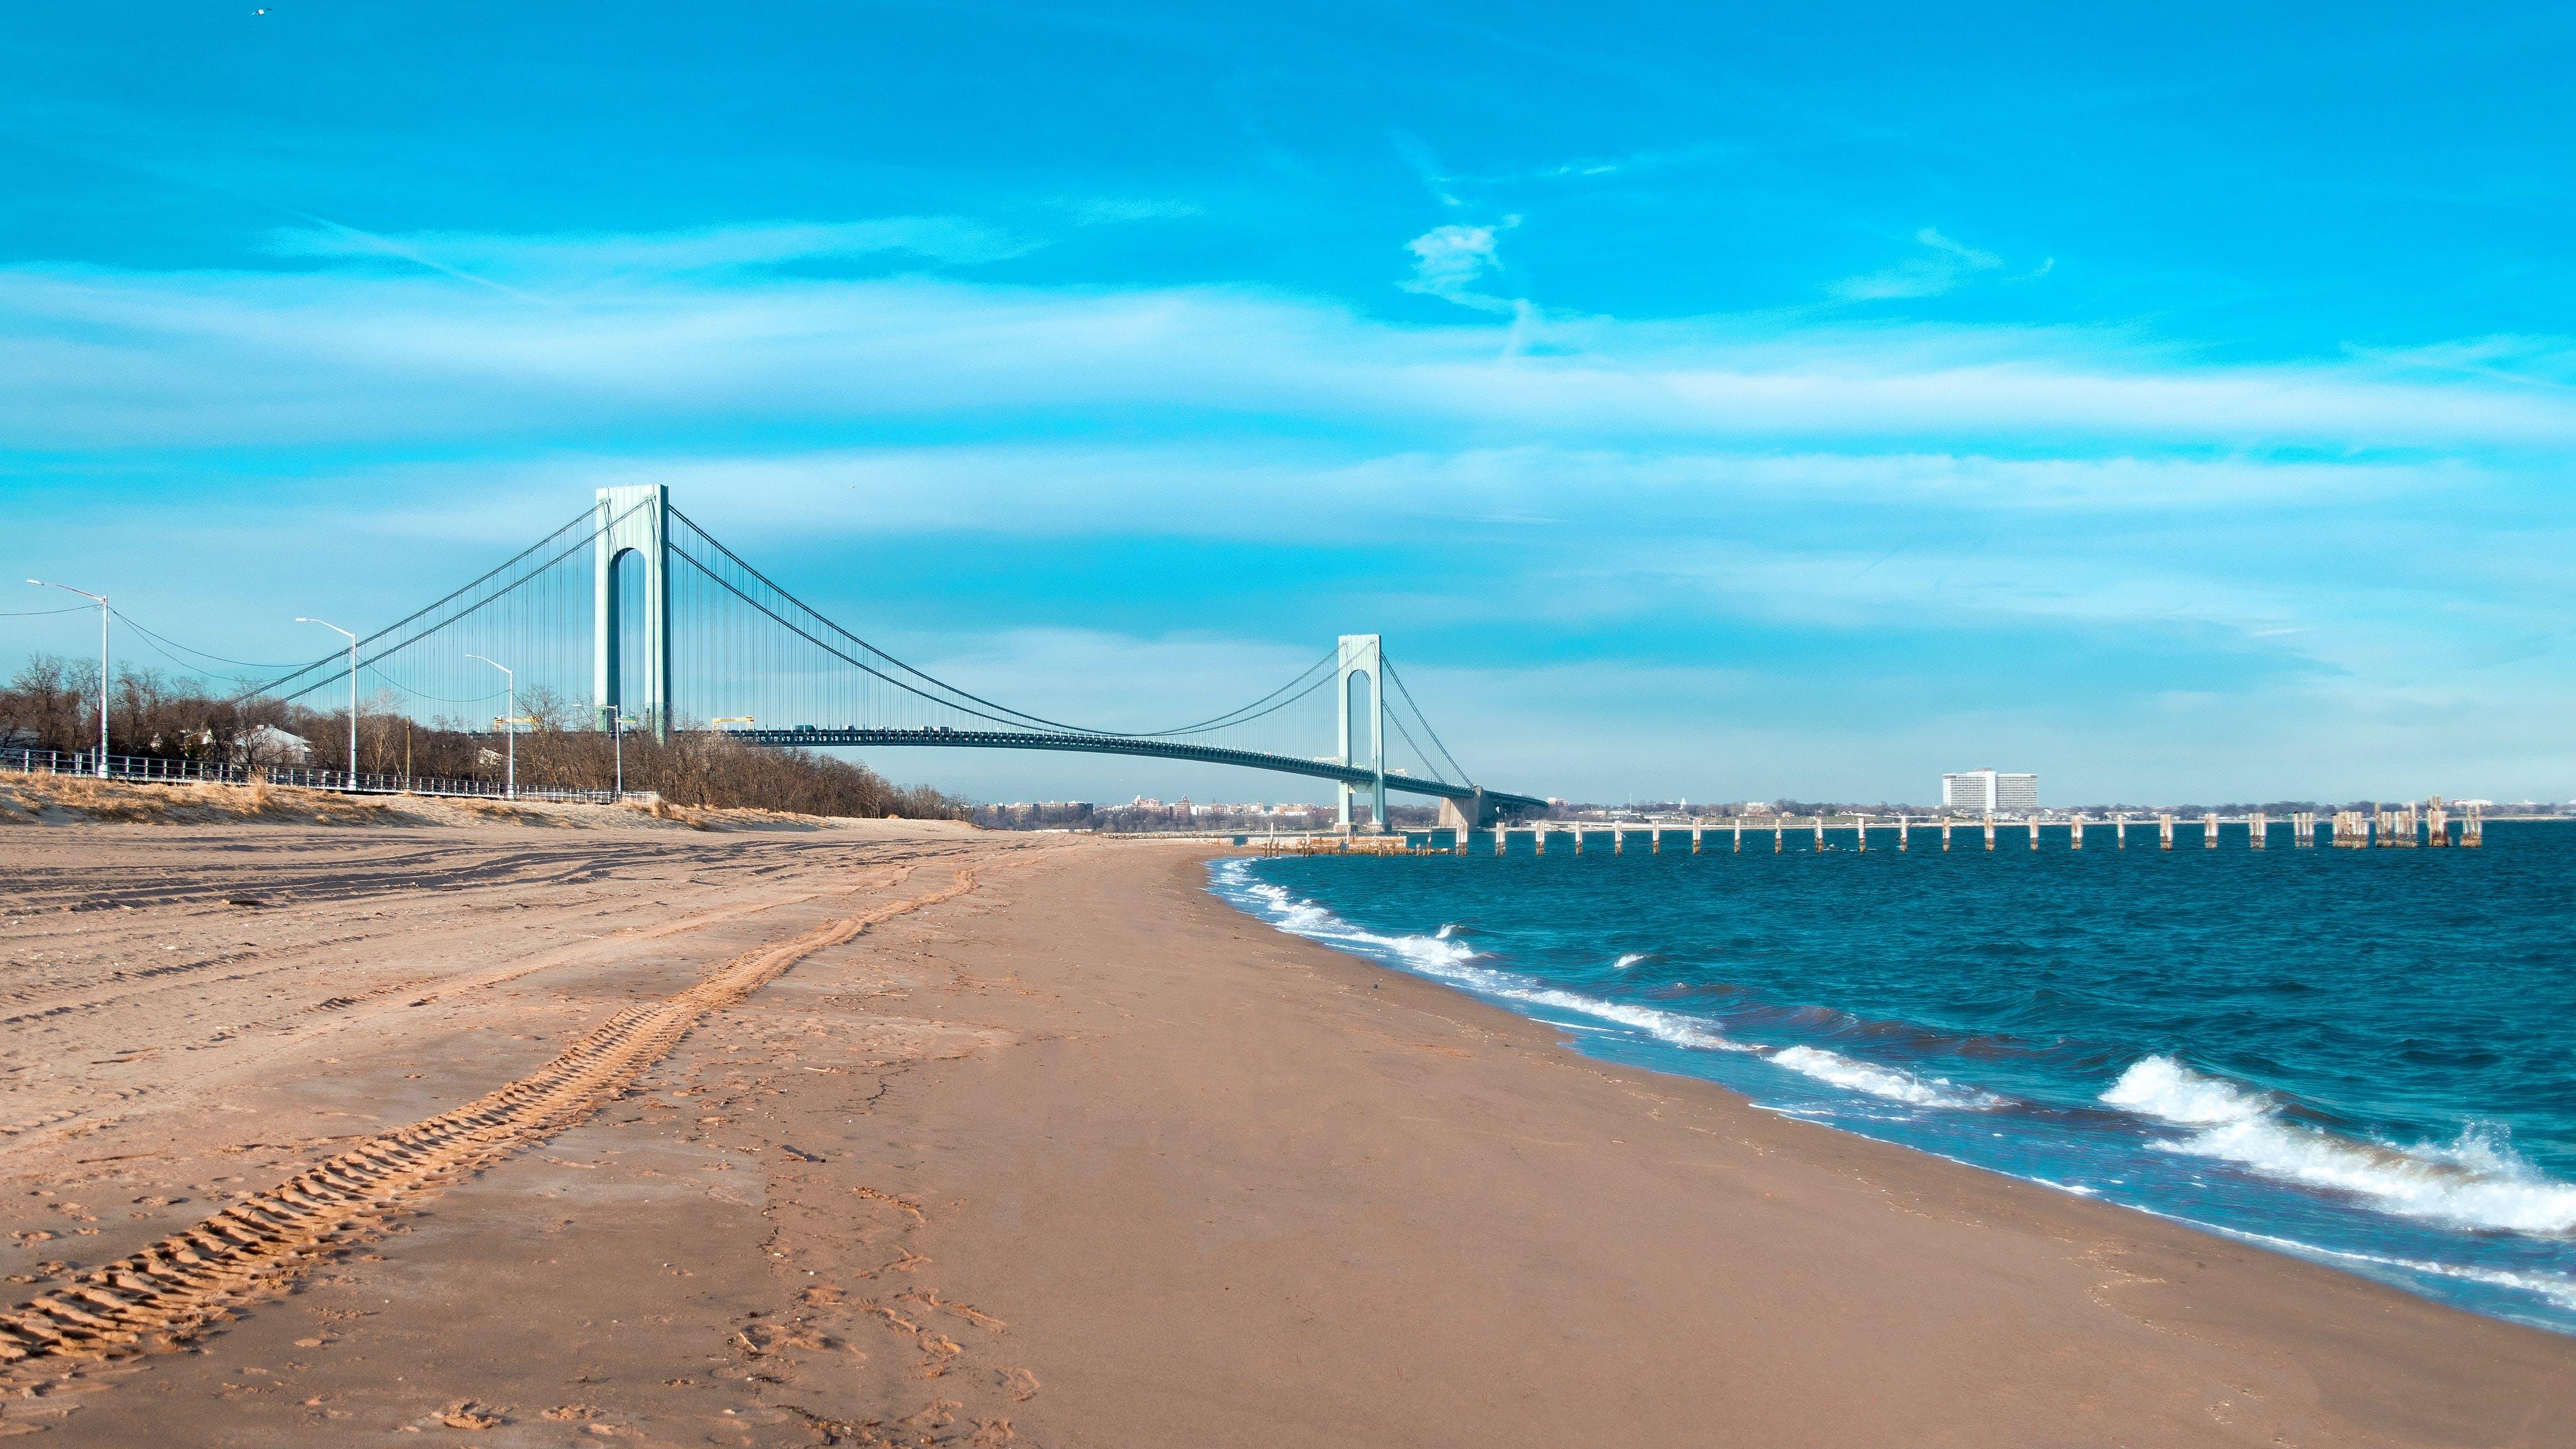 Free stock photo of 4k wallpaper, beach, blue skies, bridge